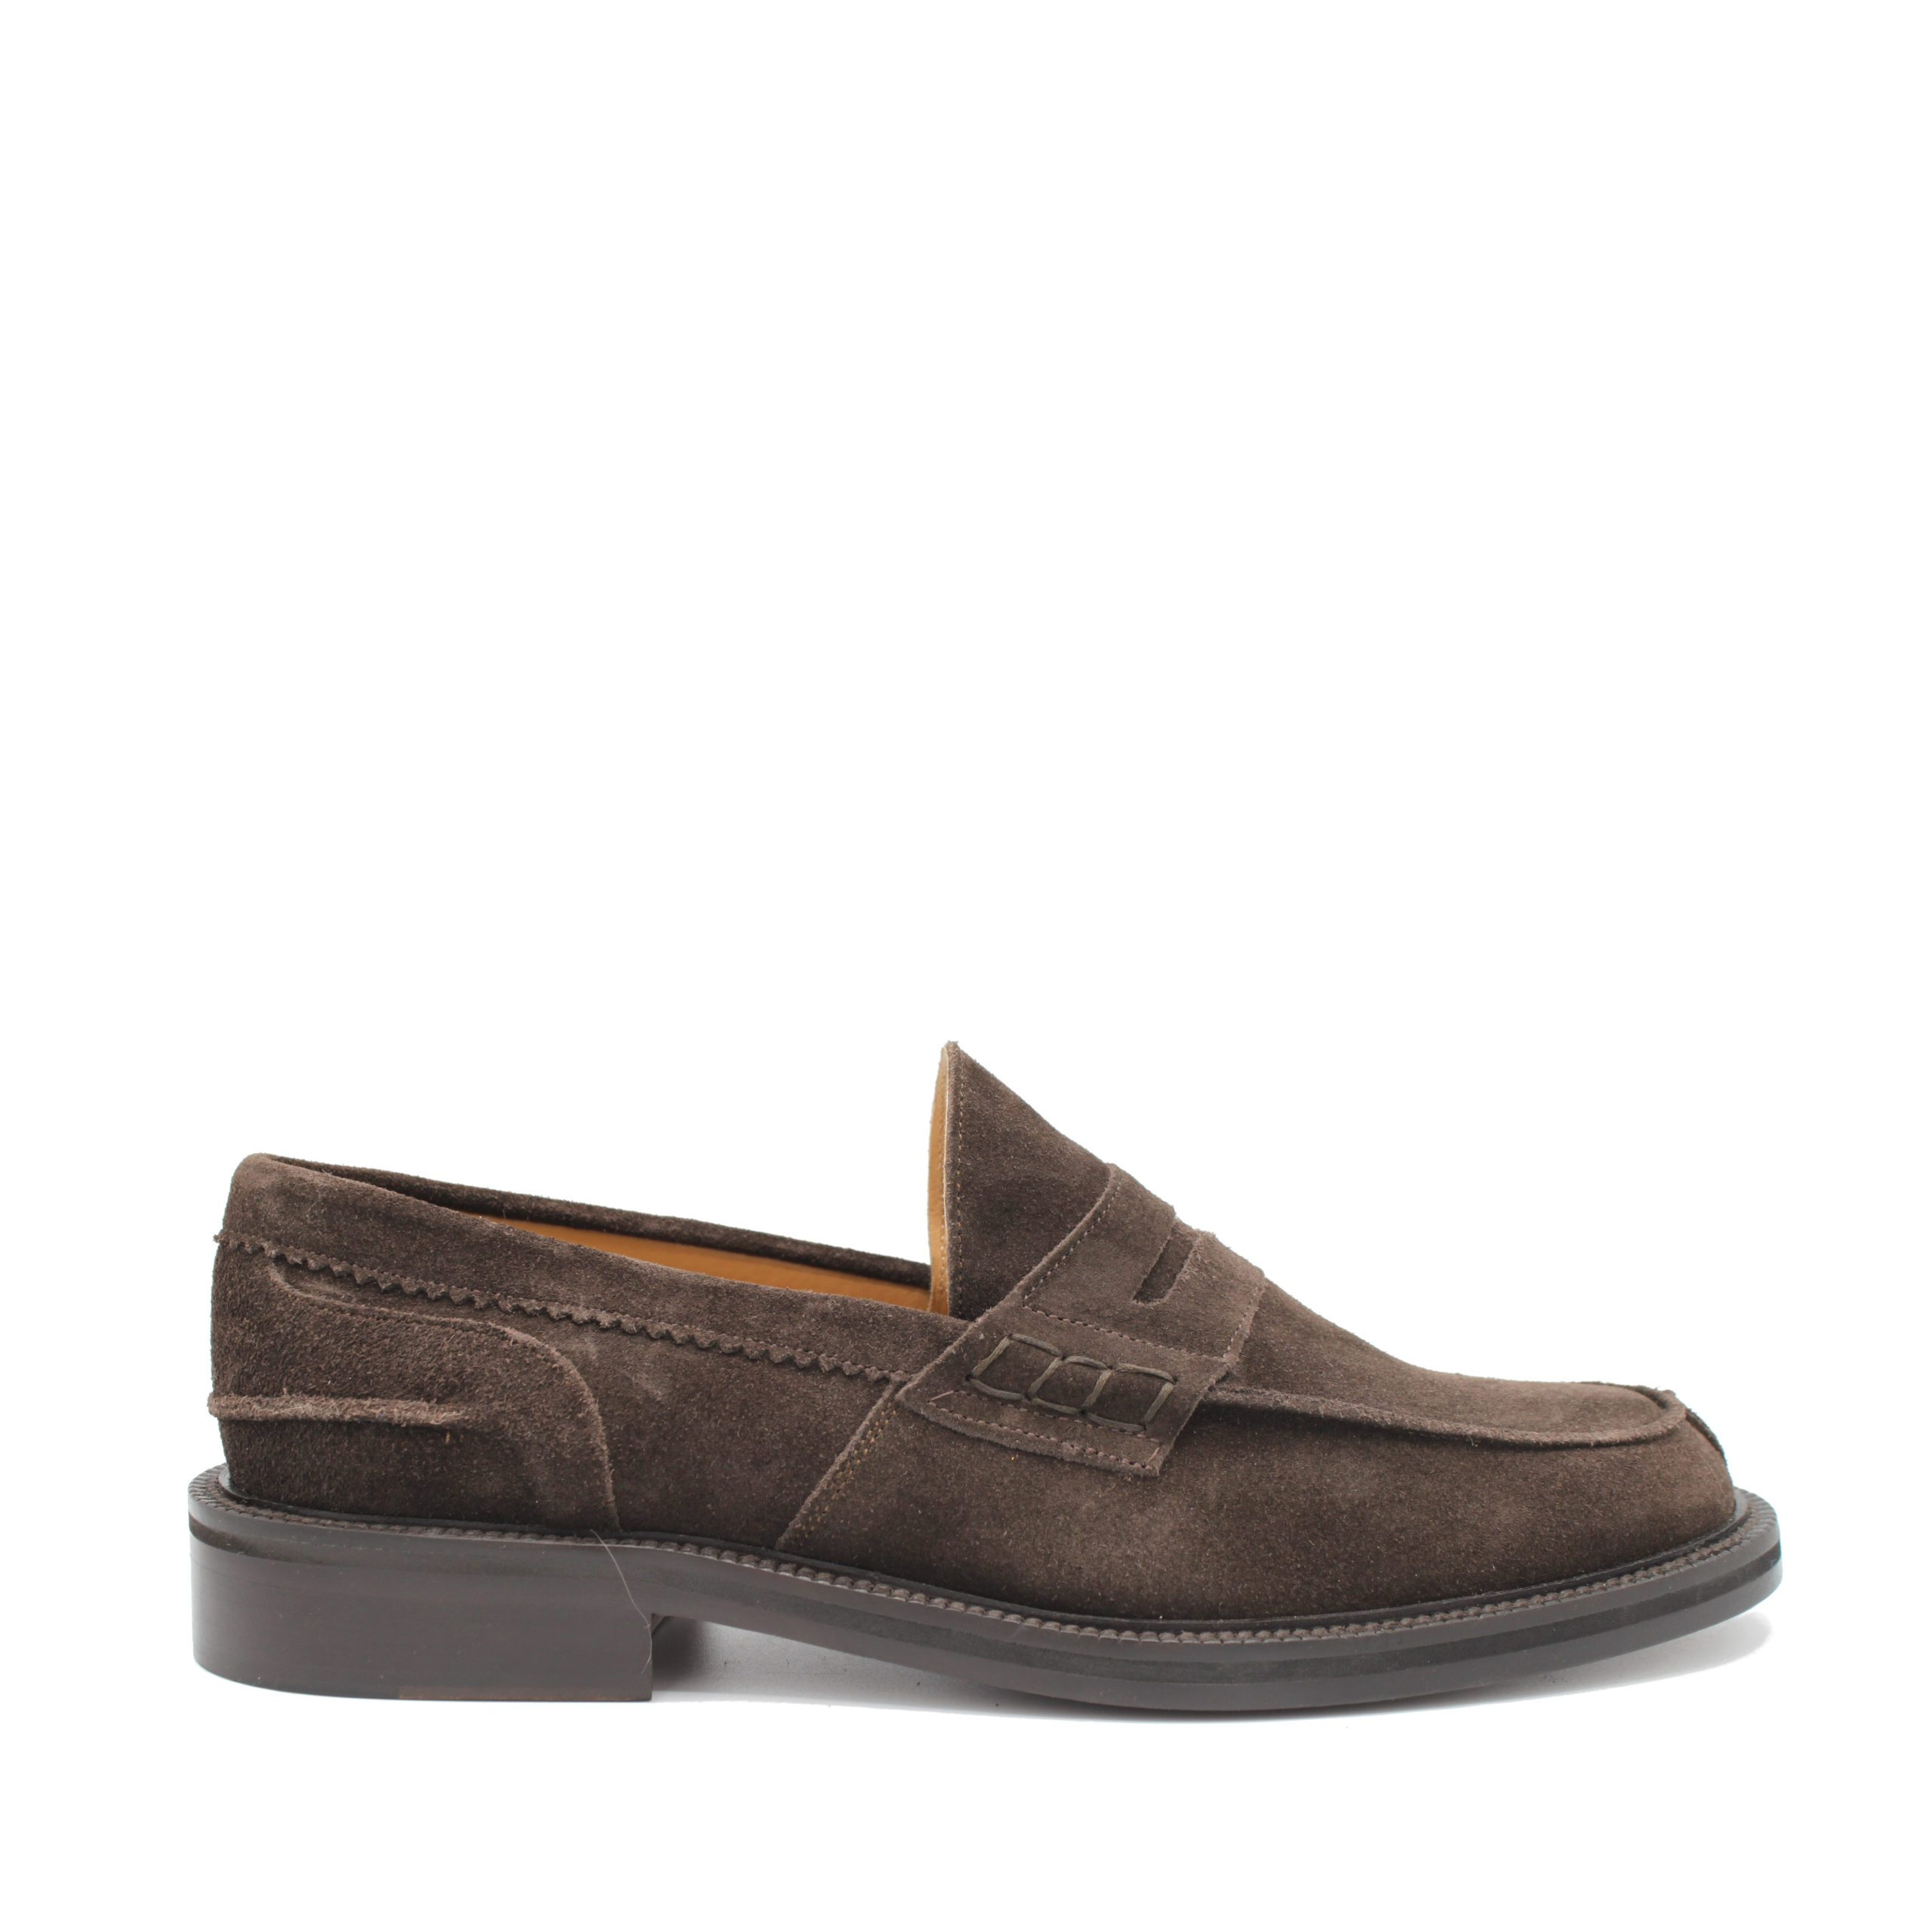 Saxone of Scotland Men's Suede Leather Loafer Brown 030_Dark - EU41.5/US8.5